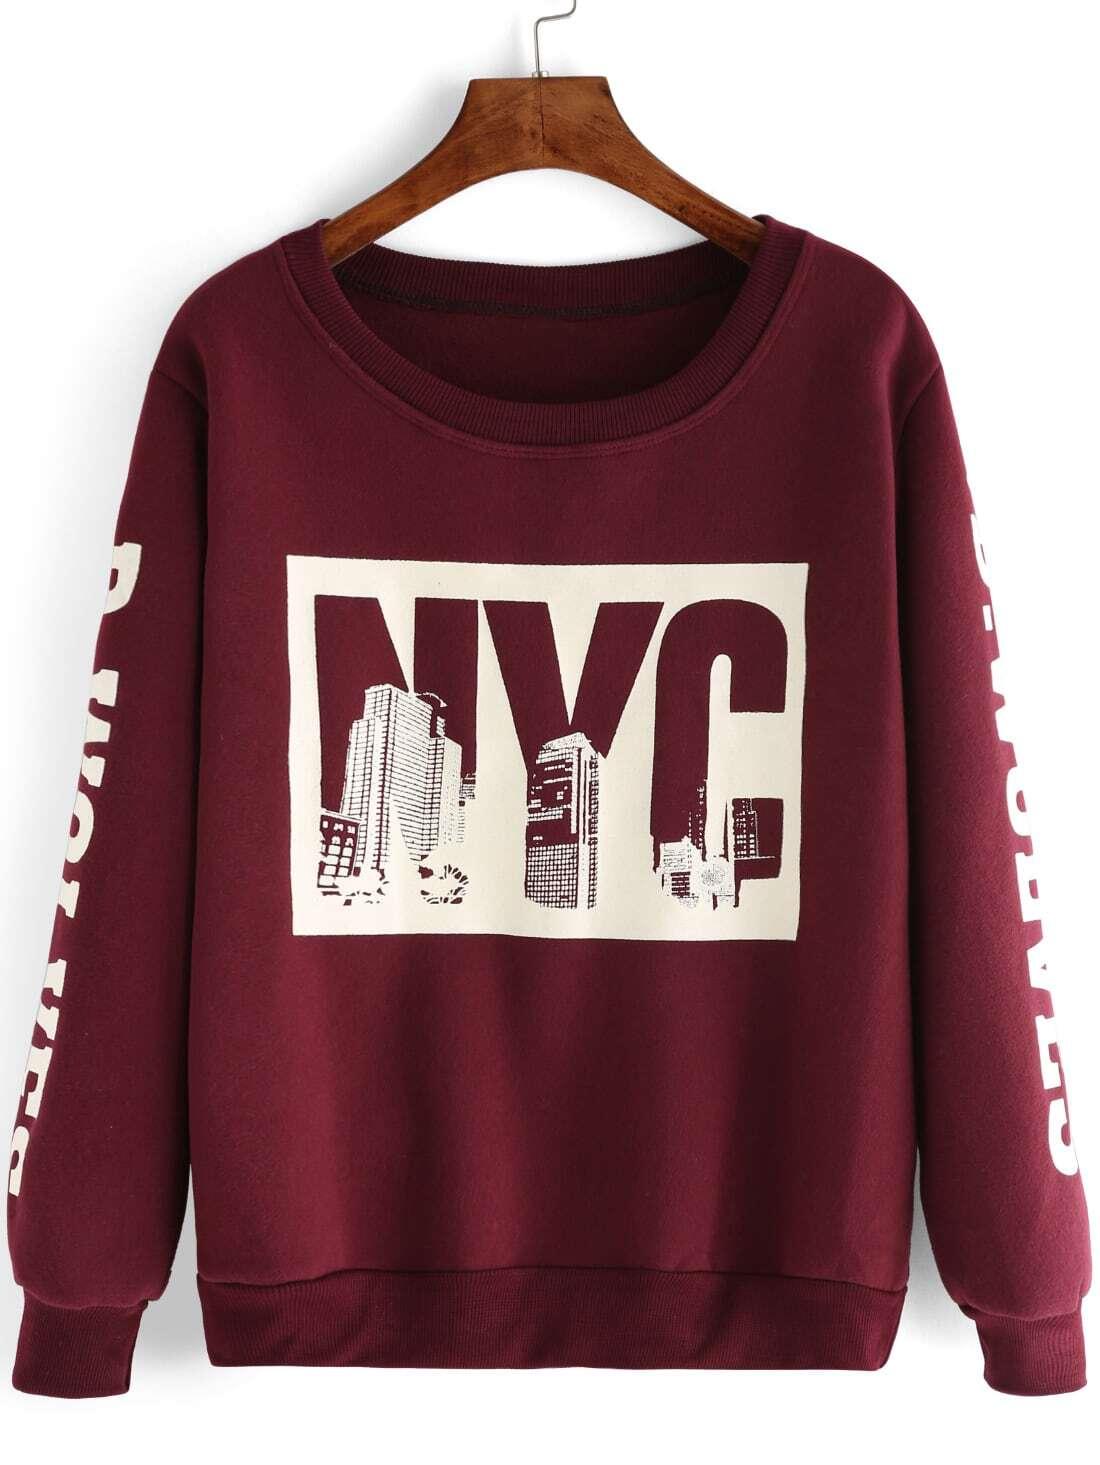 Letter print maroon sweatshirtfor women romwe for Letters for sweatshirts